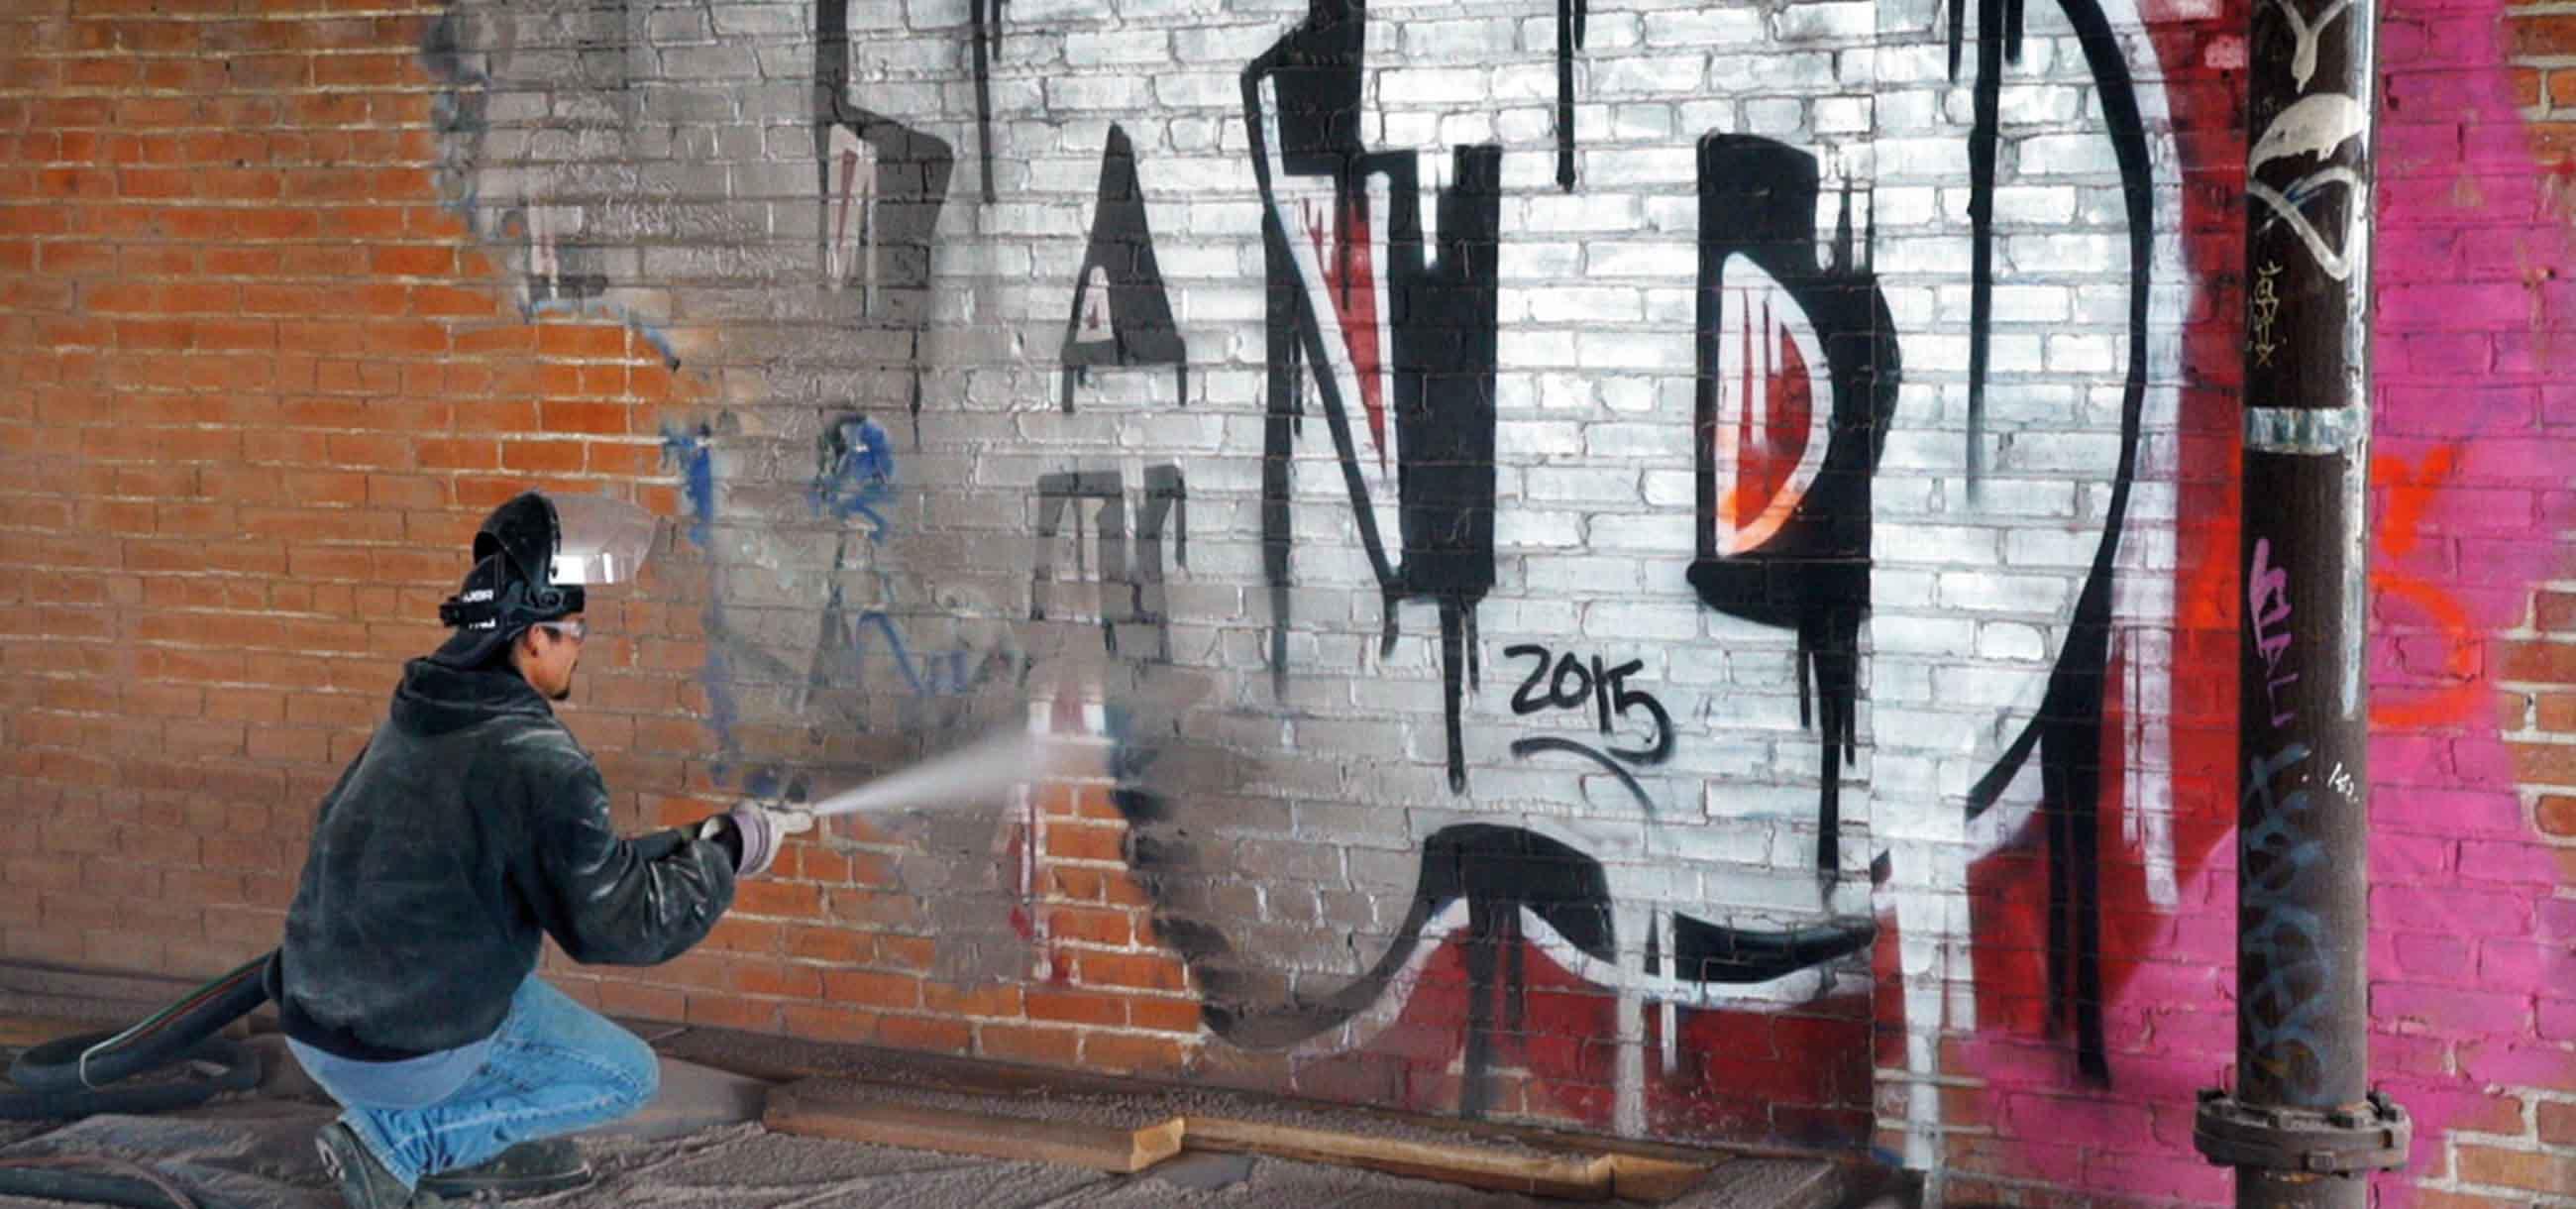 removing graffiti from brick wall